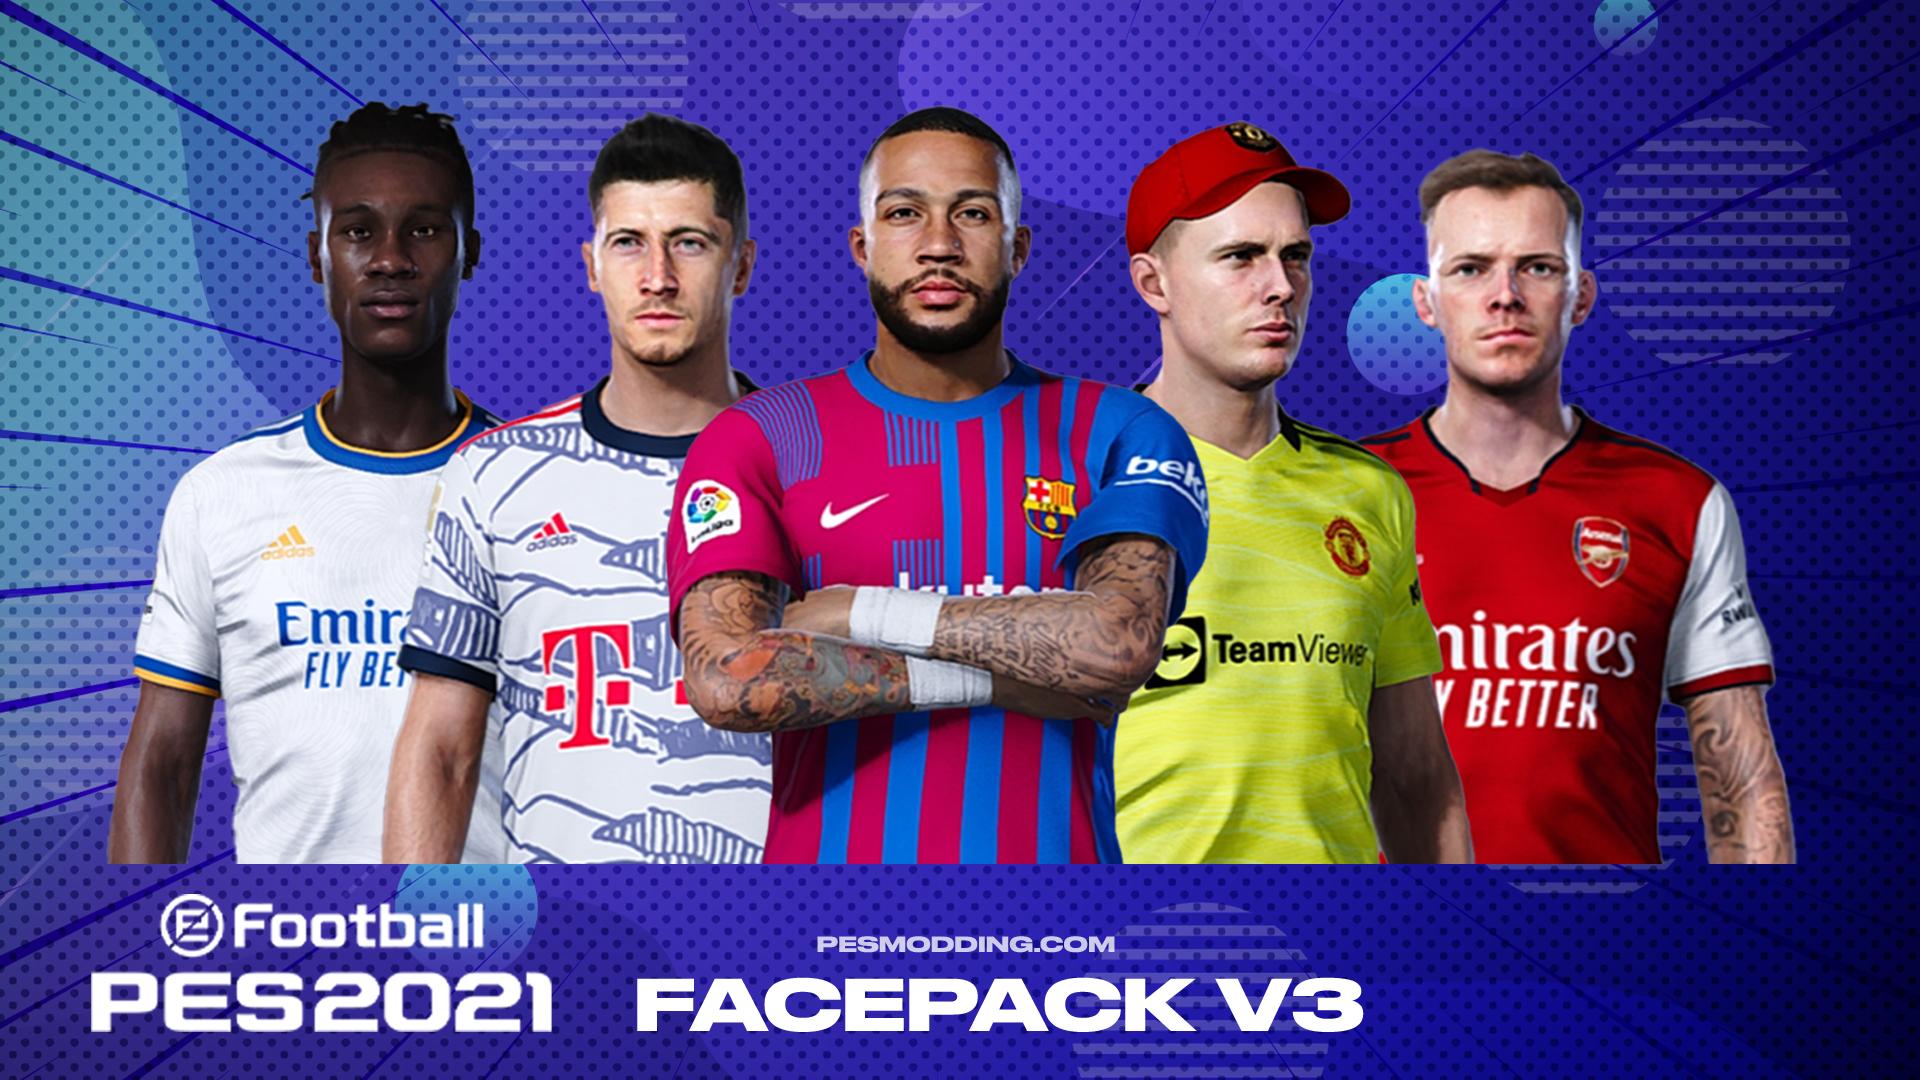 PES 2021 Facepack V3 | Sider And CPK Version